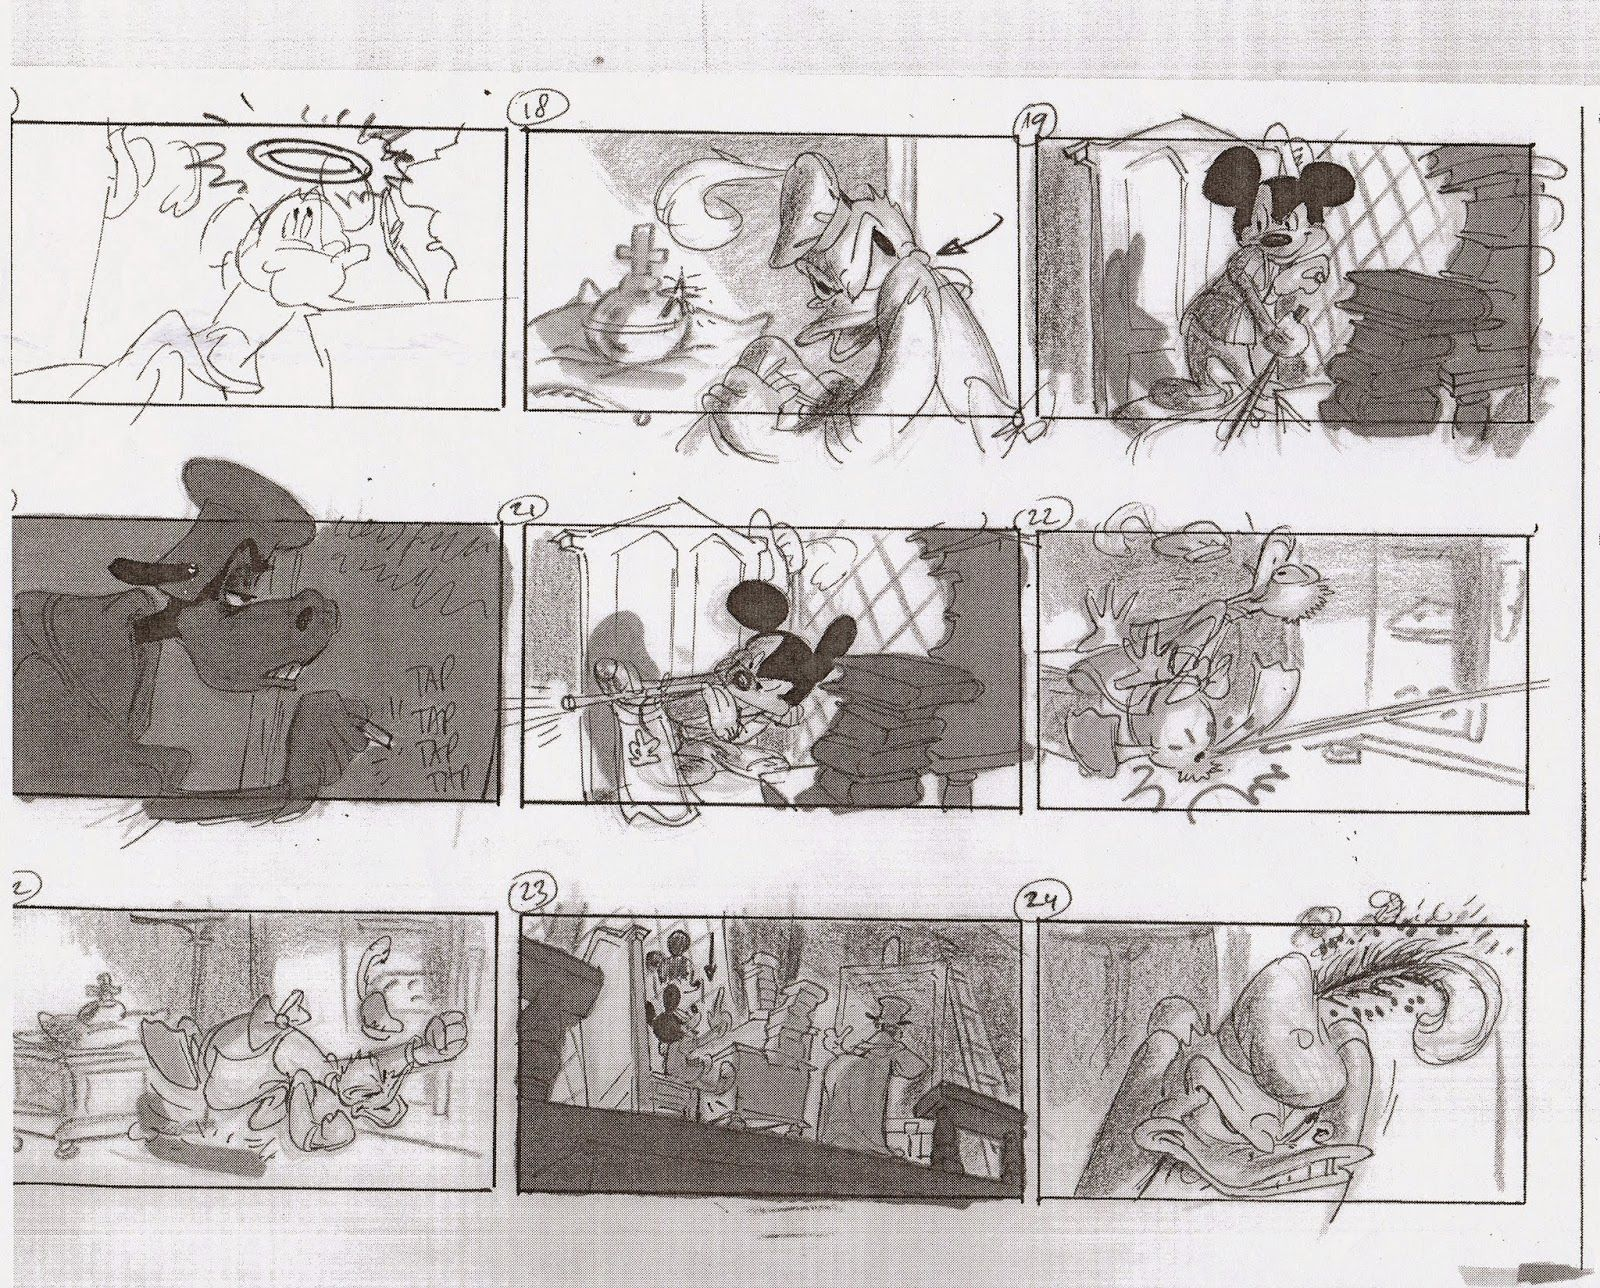 Deja View  Famous Dutch Comic Artist Daan Jippes